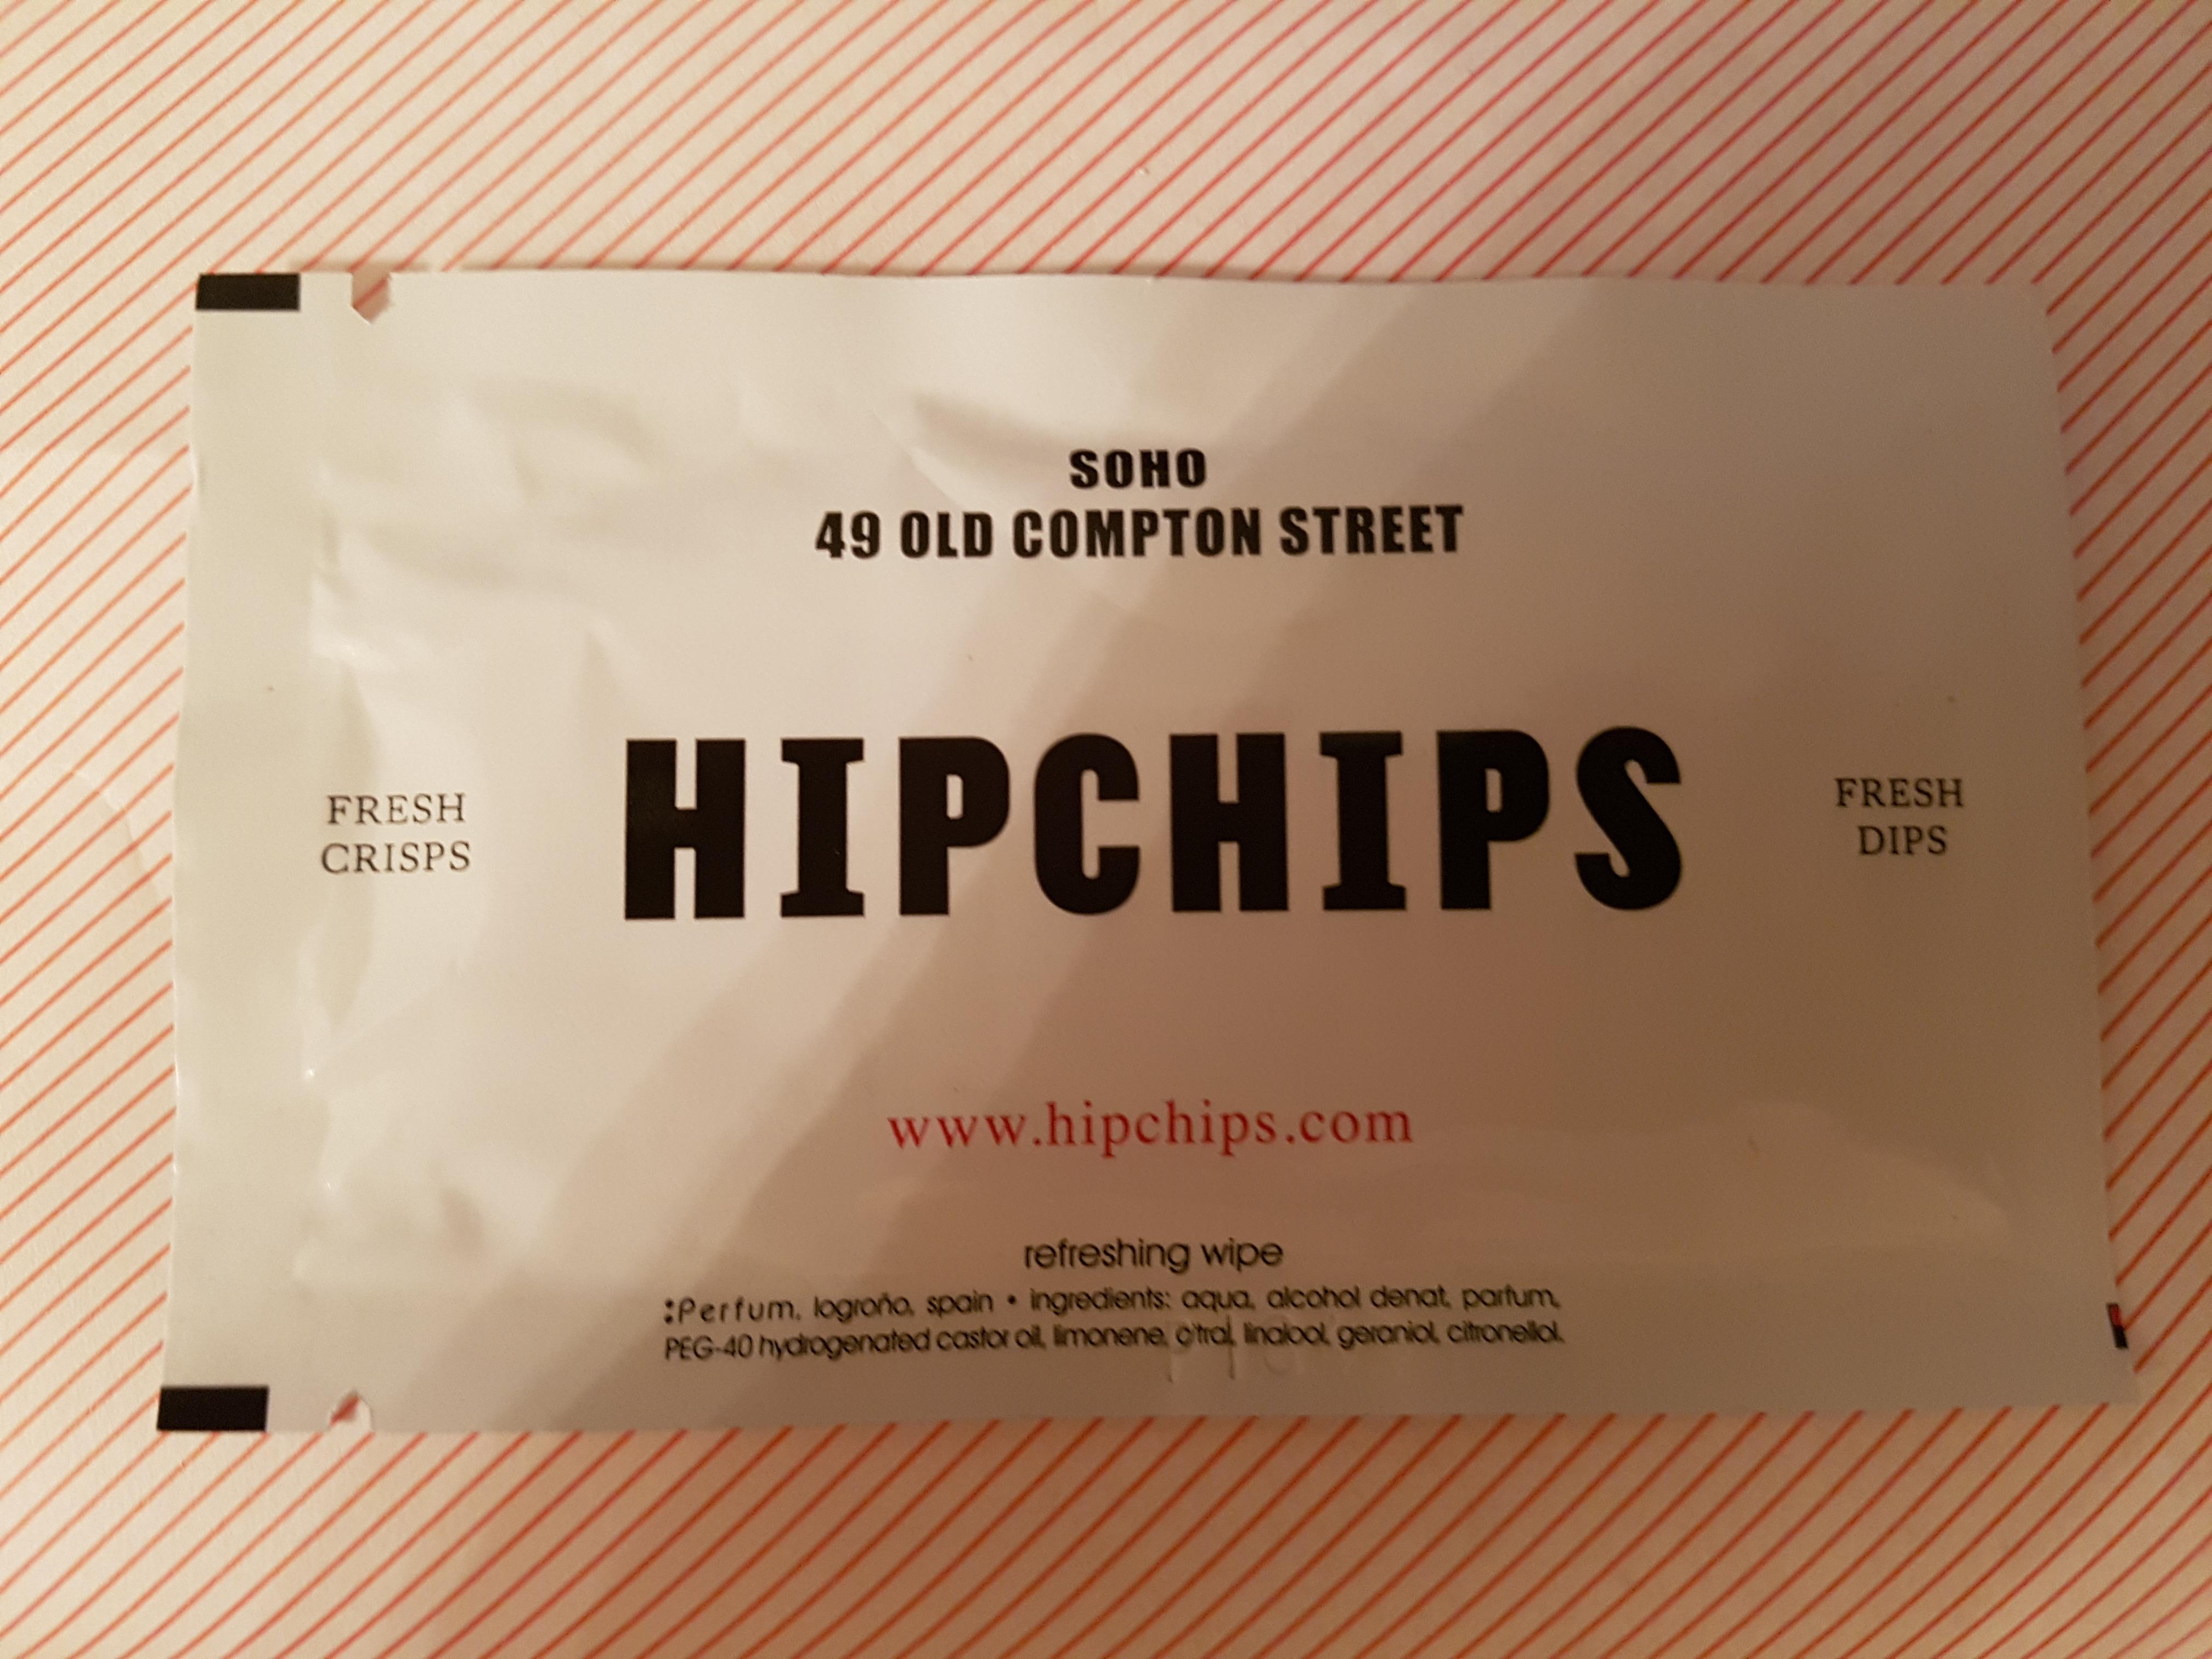 HipChips crisps wipe